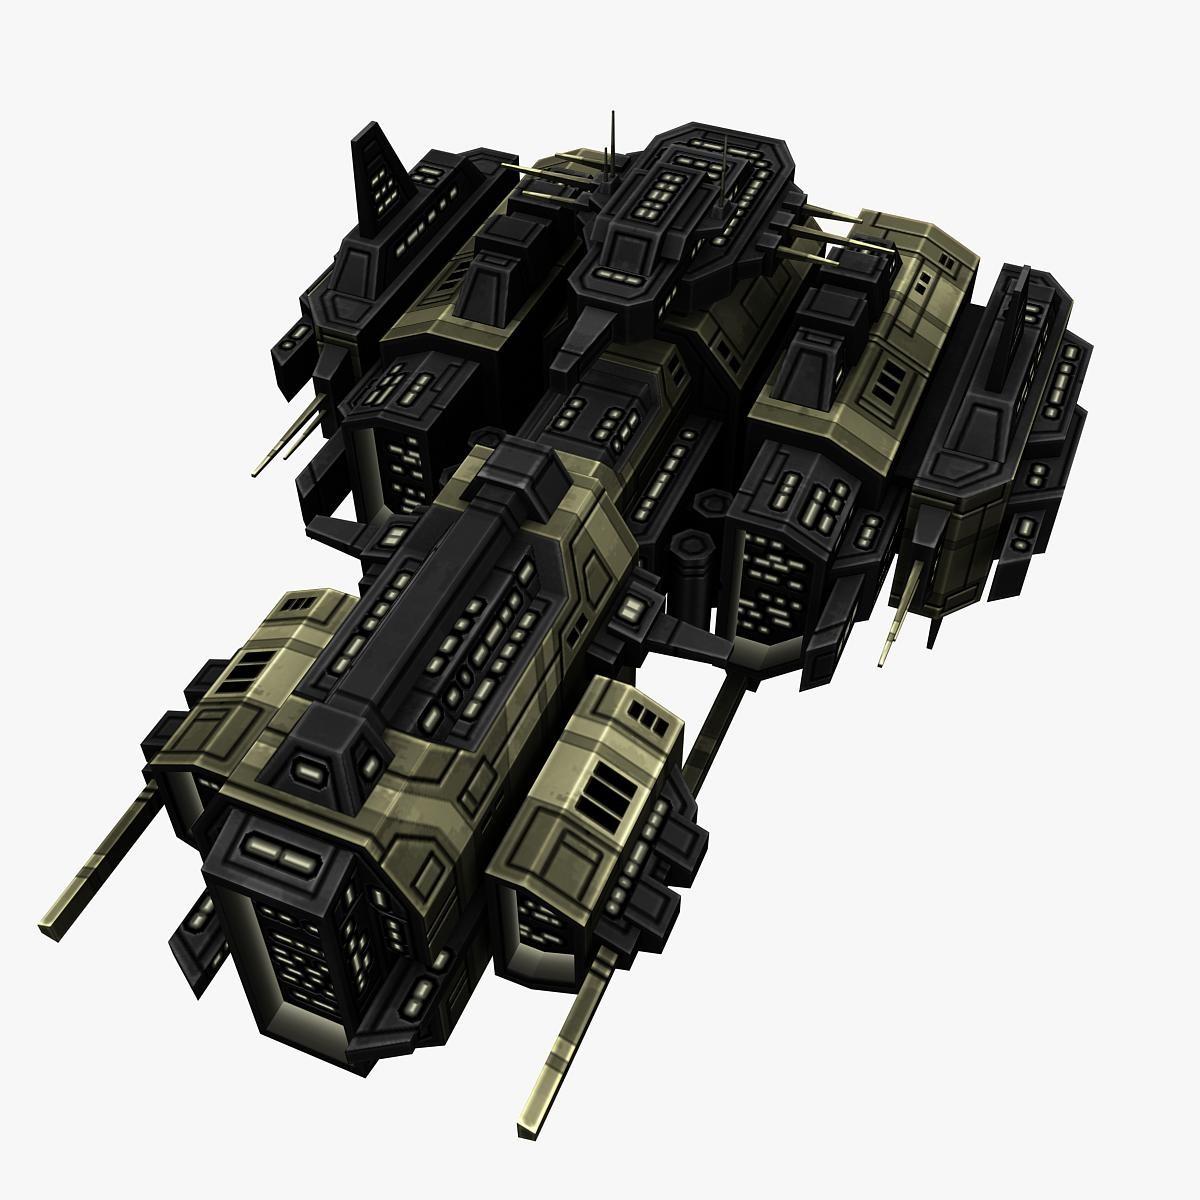 battleship_destroyer_2_upgraded_preview_0.jpg